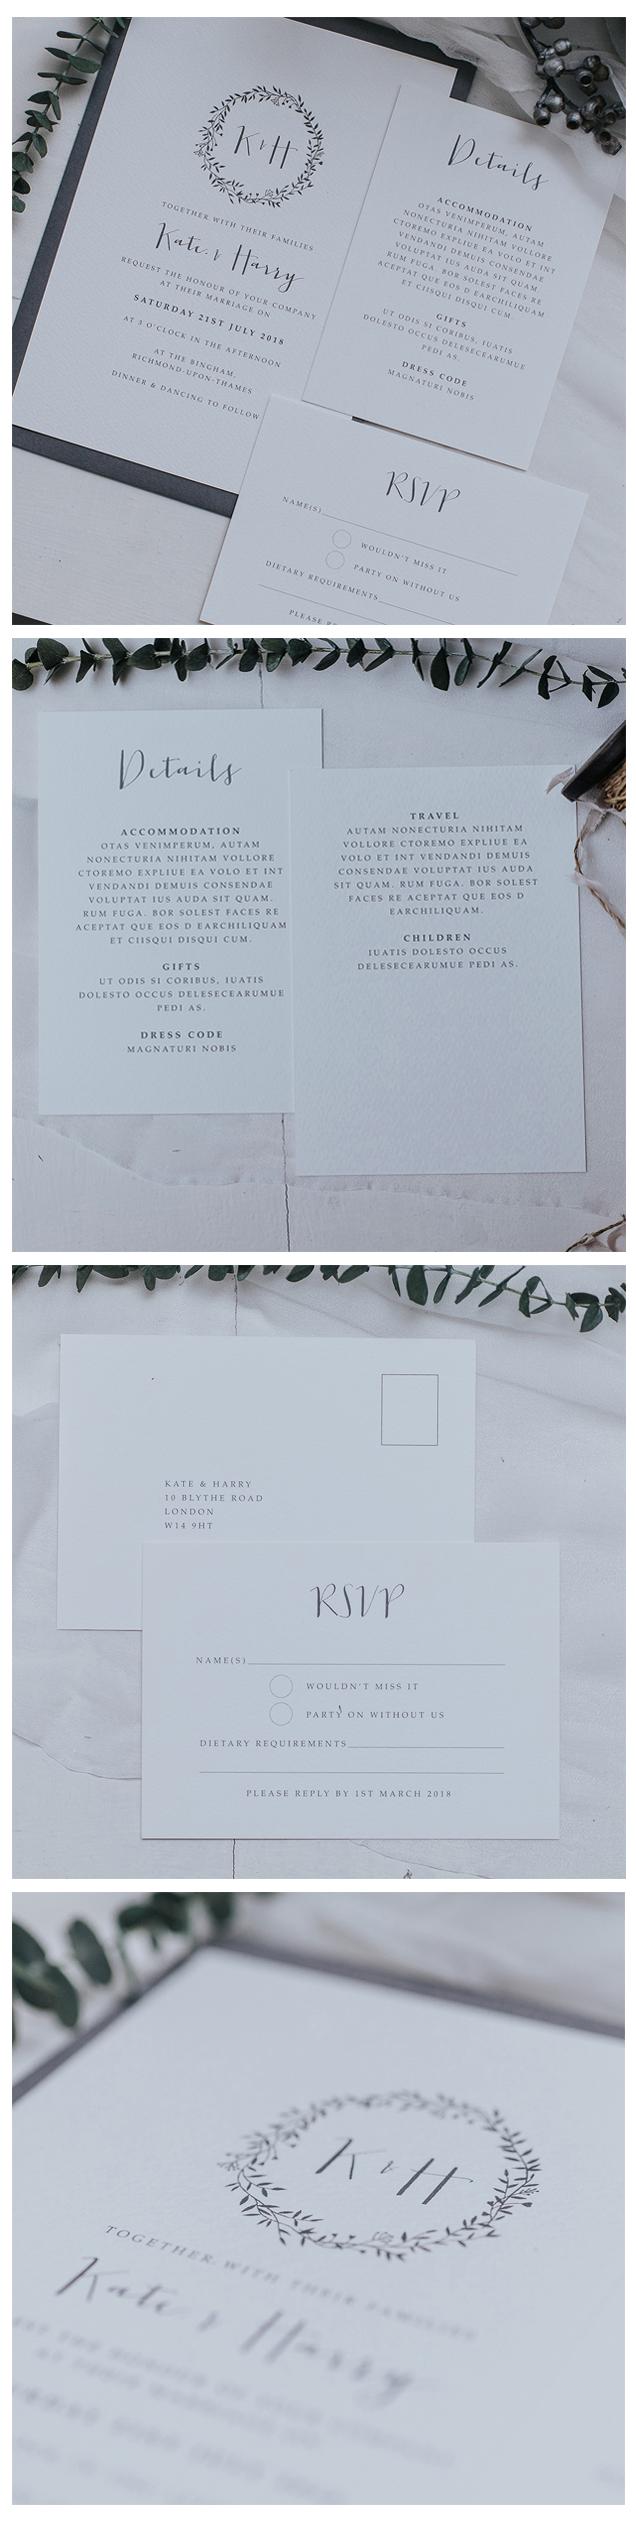 Kate-Invite-Tile.png